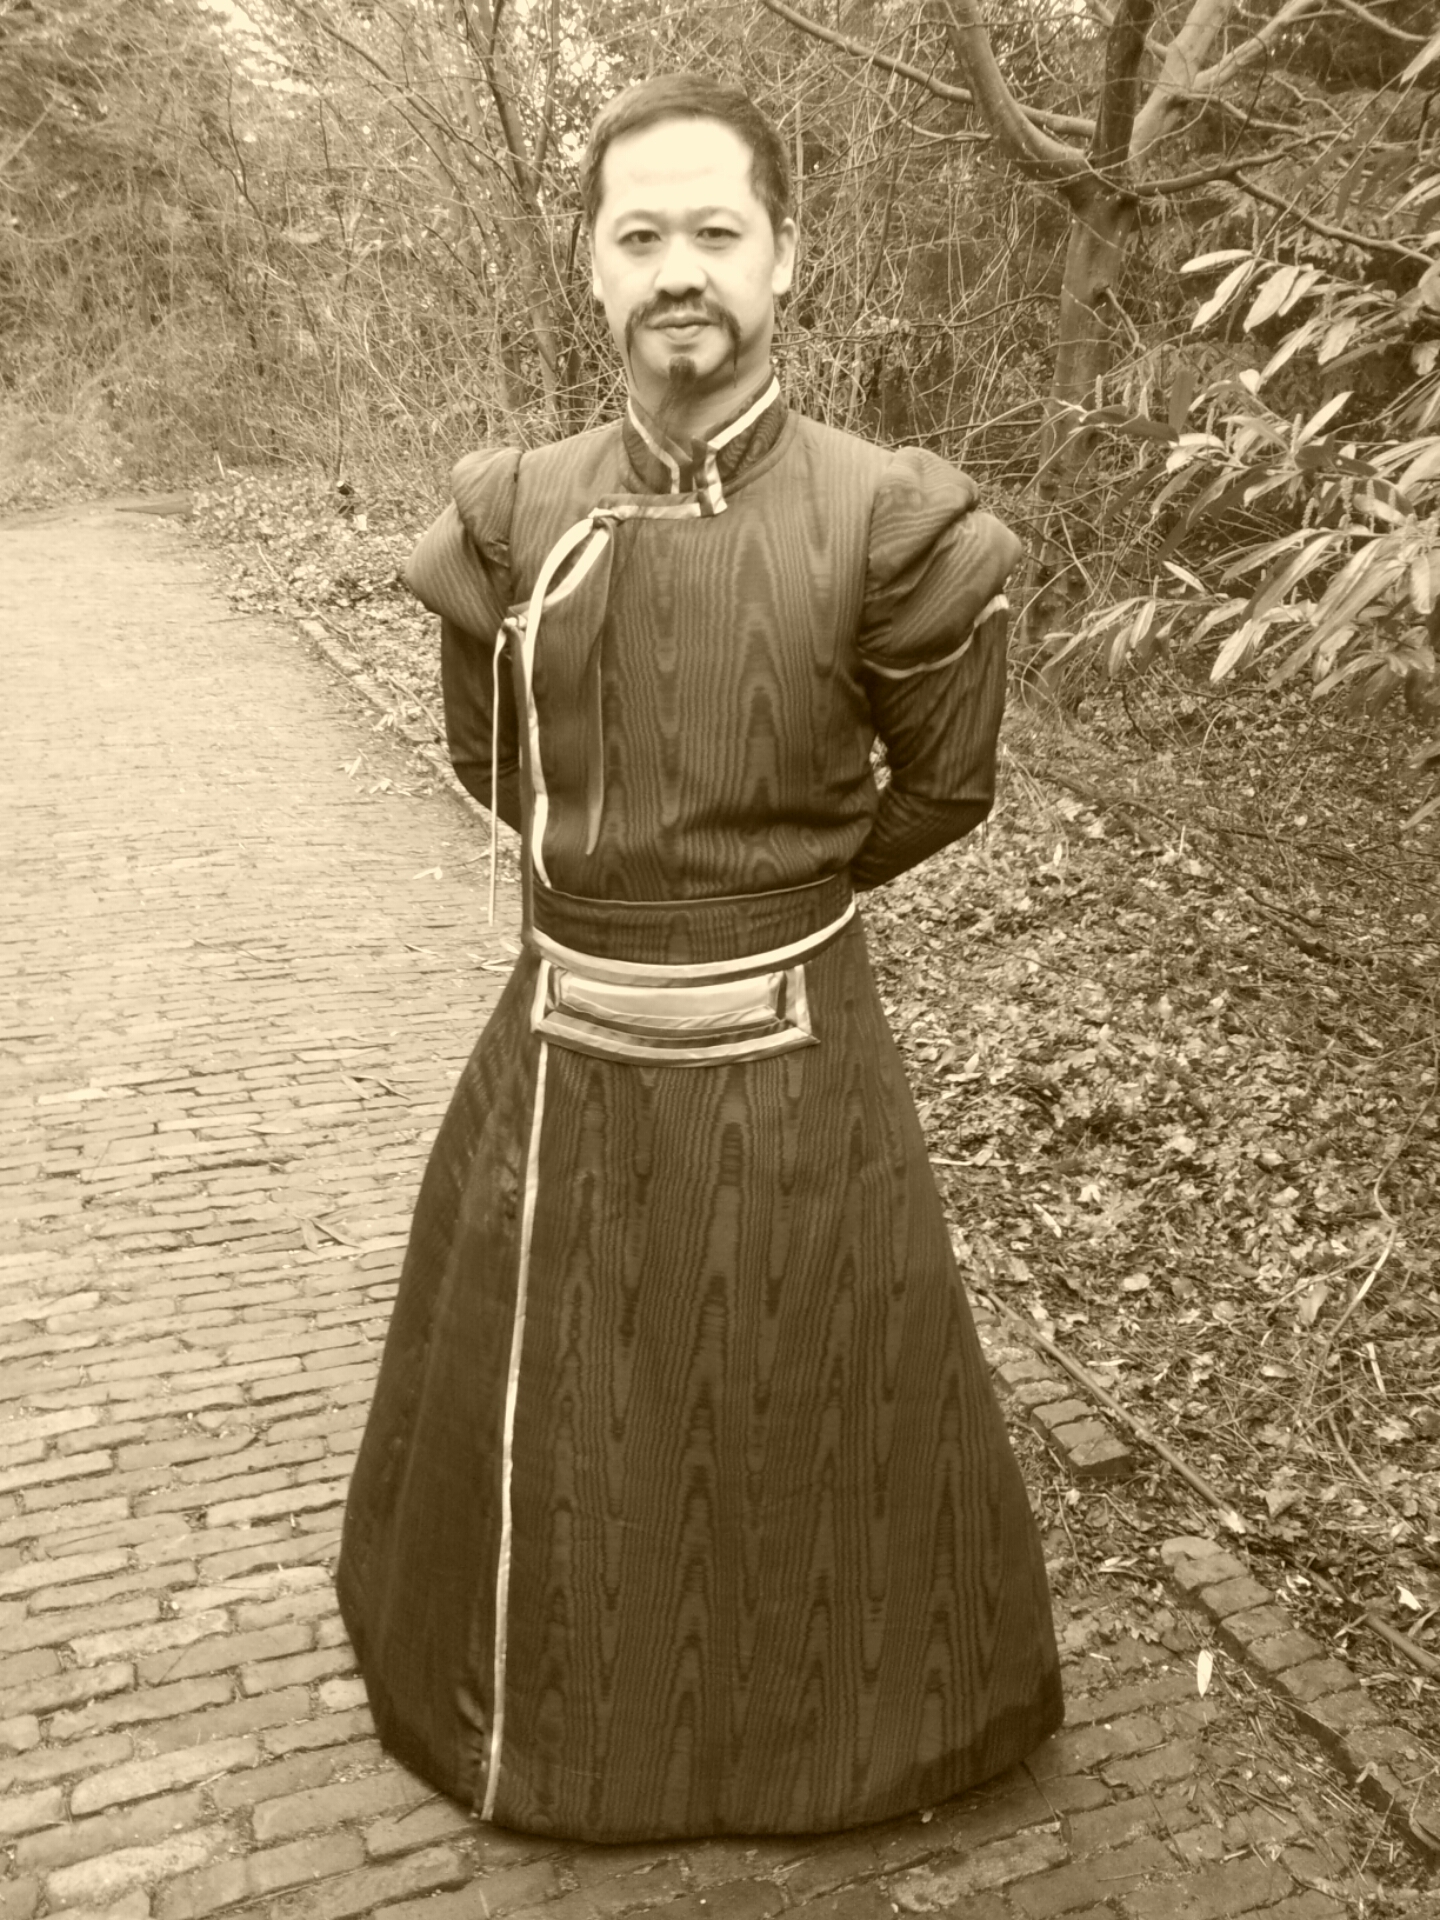 http://aaronwan.nl/wp-content/uploads/2017/01/Emperor-Aaron-Fai-body-nostalgia.jpg